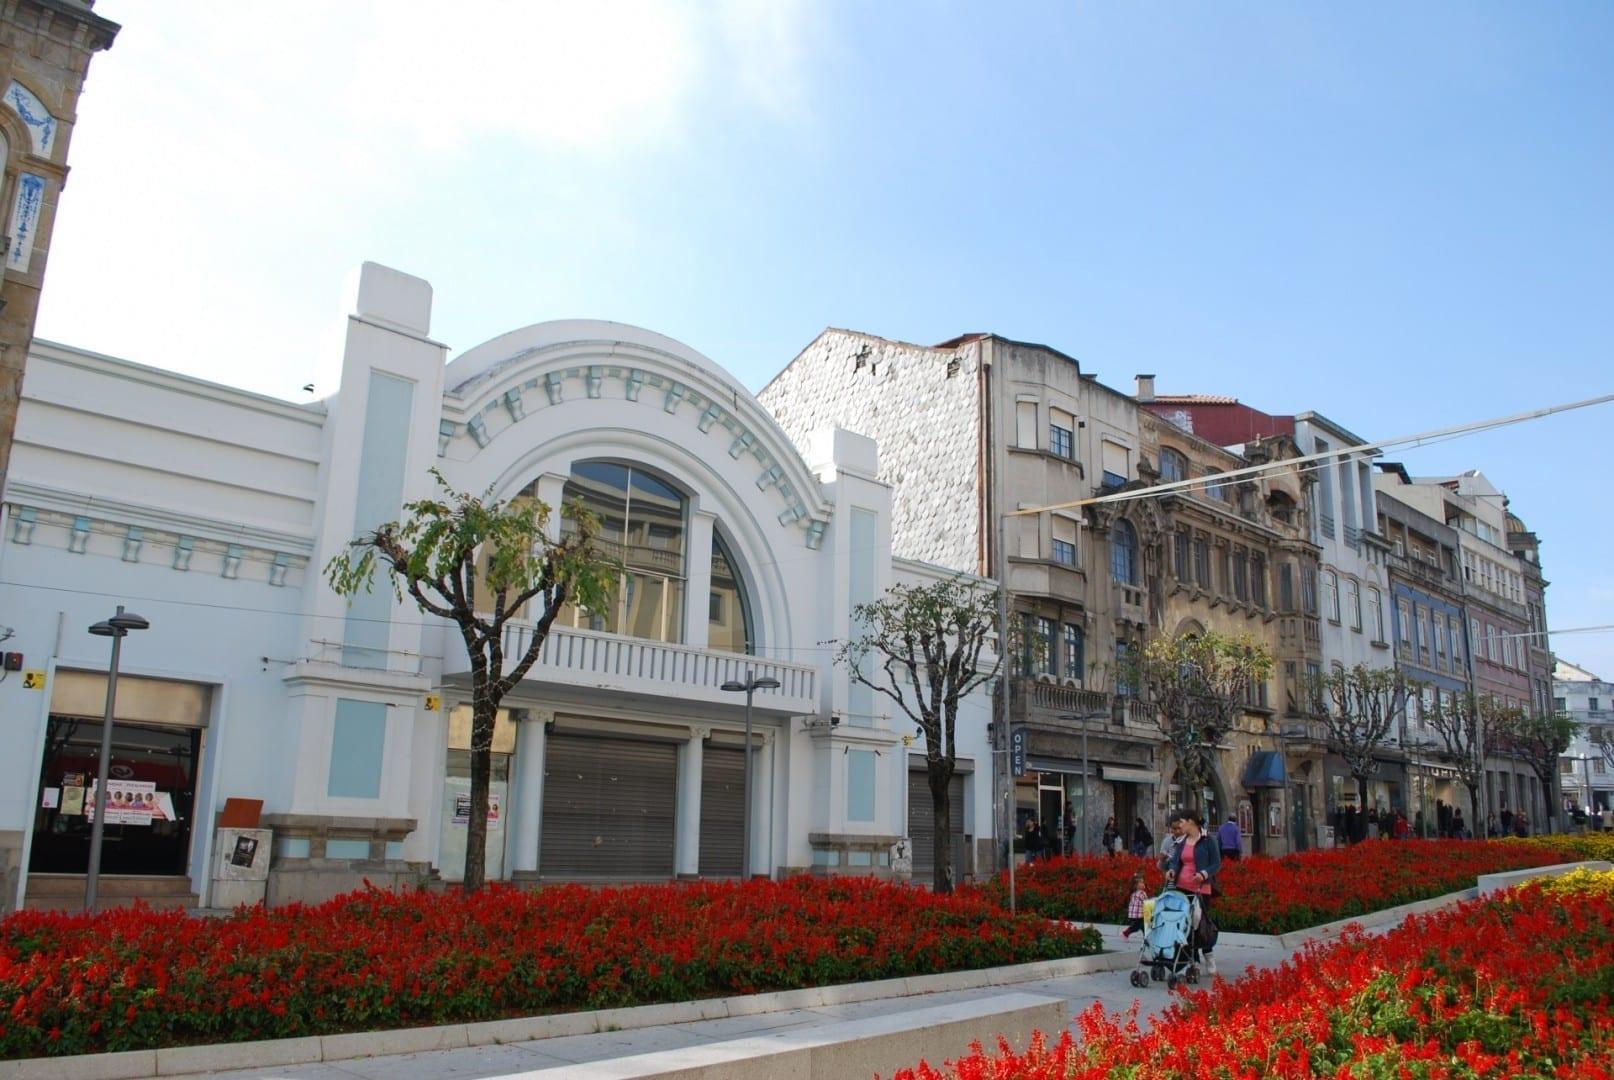 Los edificios históricos de la Avenida da Liberdade Braga Portugal